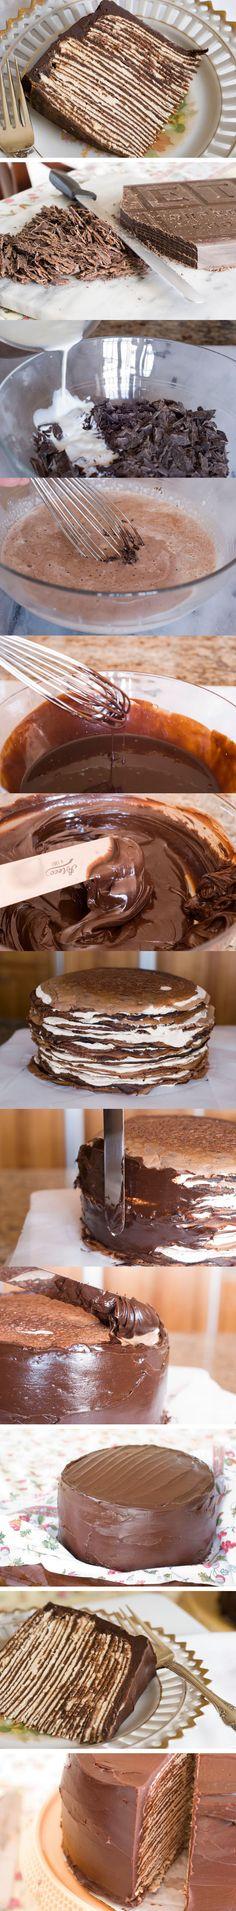 Pecados de Reposteria Tarta de crepes con chocolate - Pecados de Reposteria